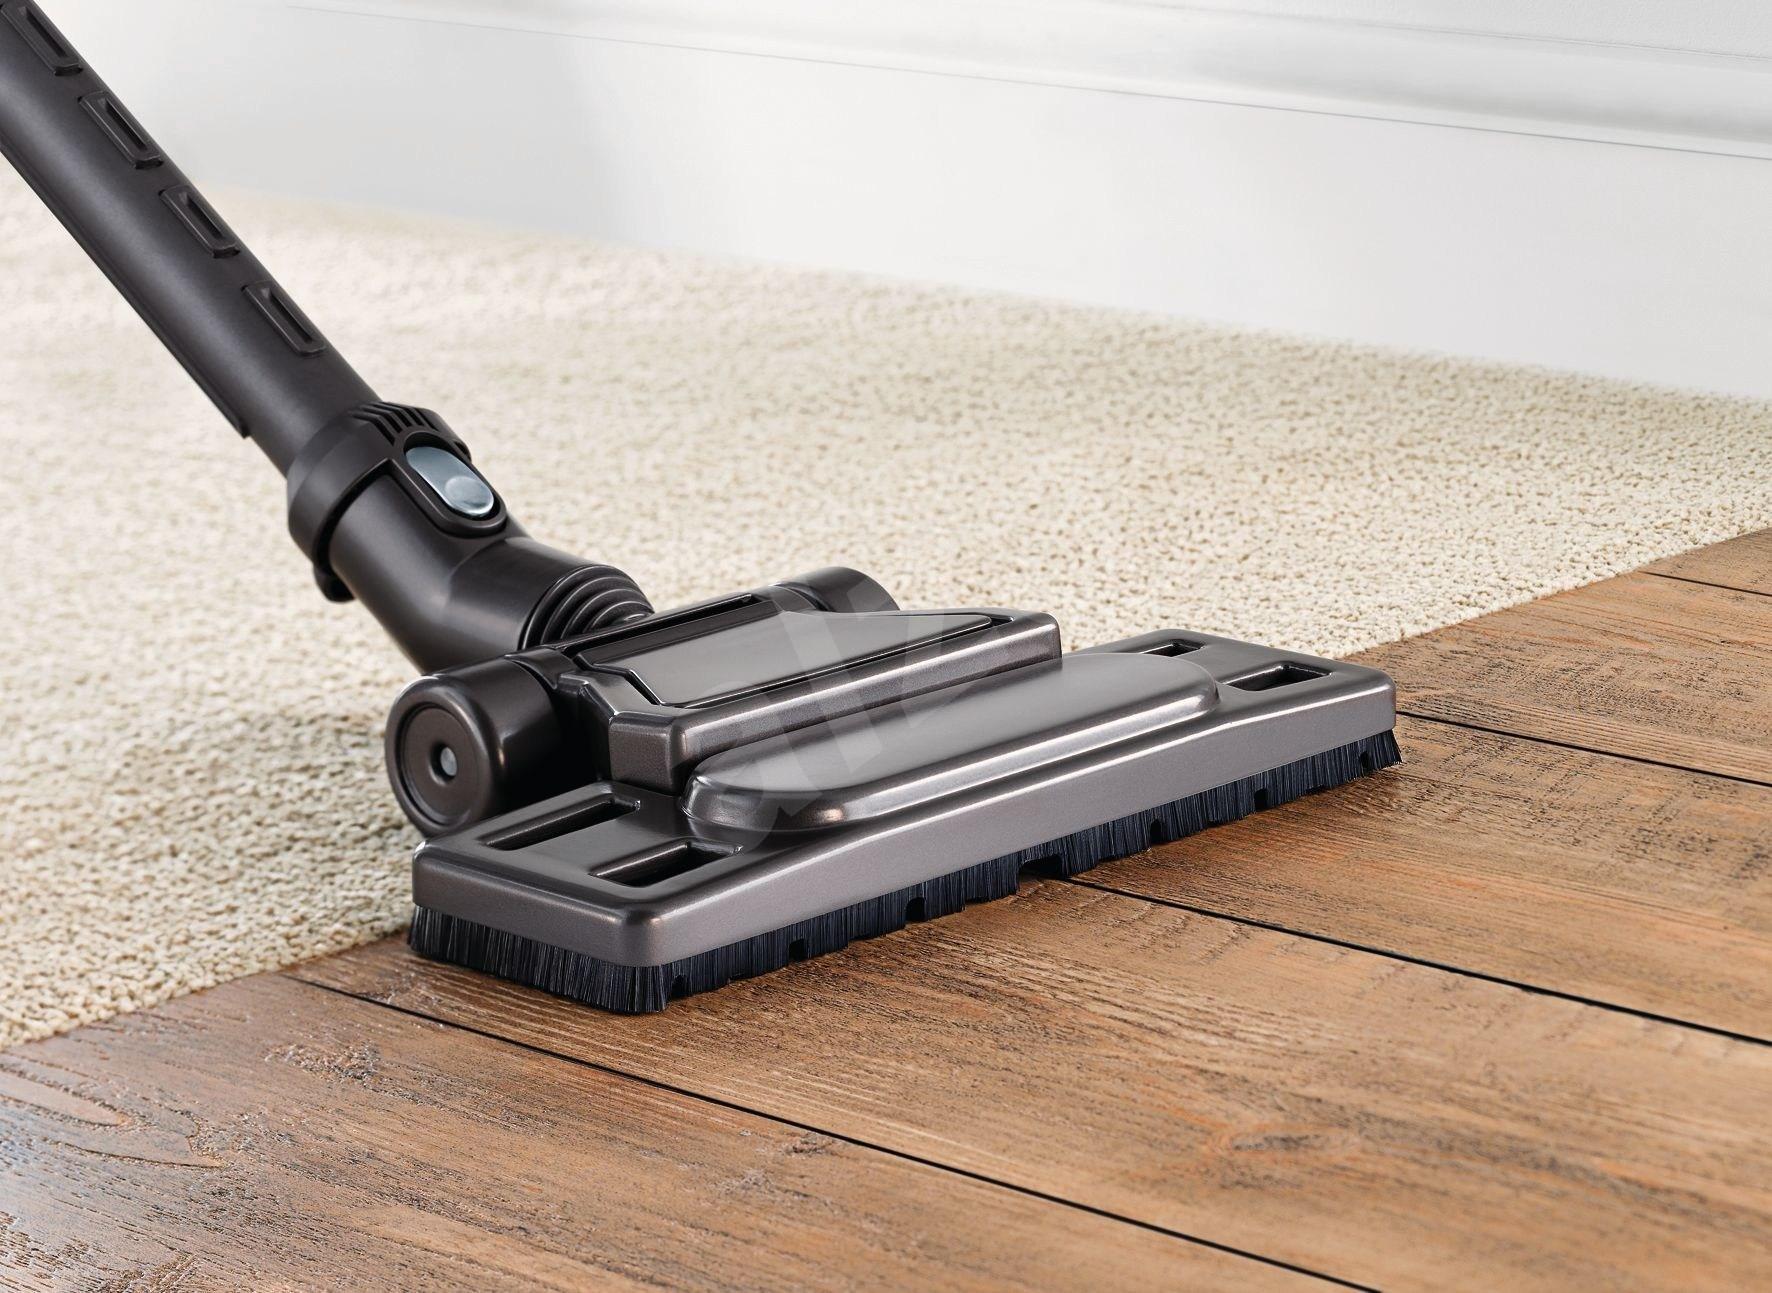 dyson dc33c allergy parquet vacuum cleaner. Black Bedroom Furniture Sets. Home Design Ideas